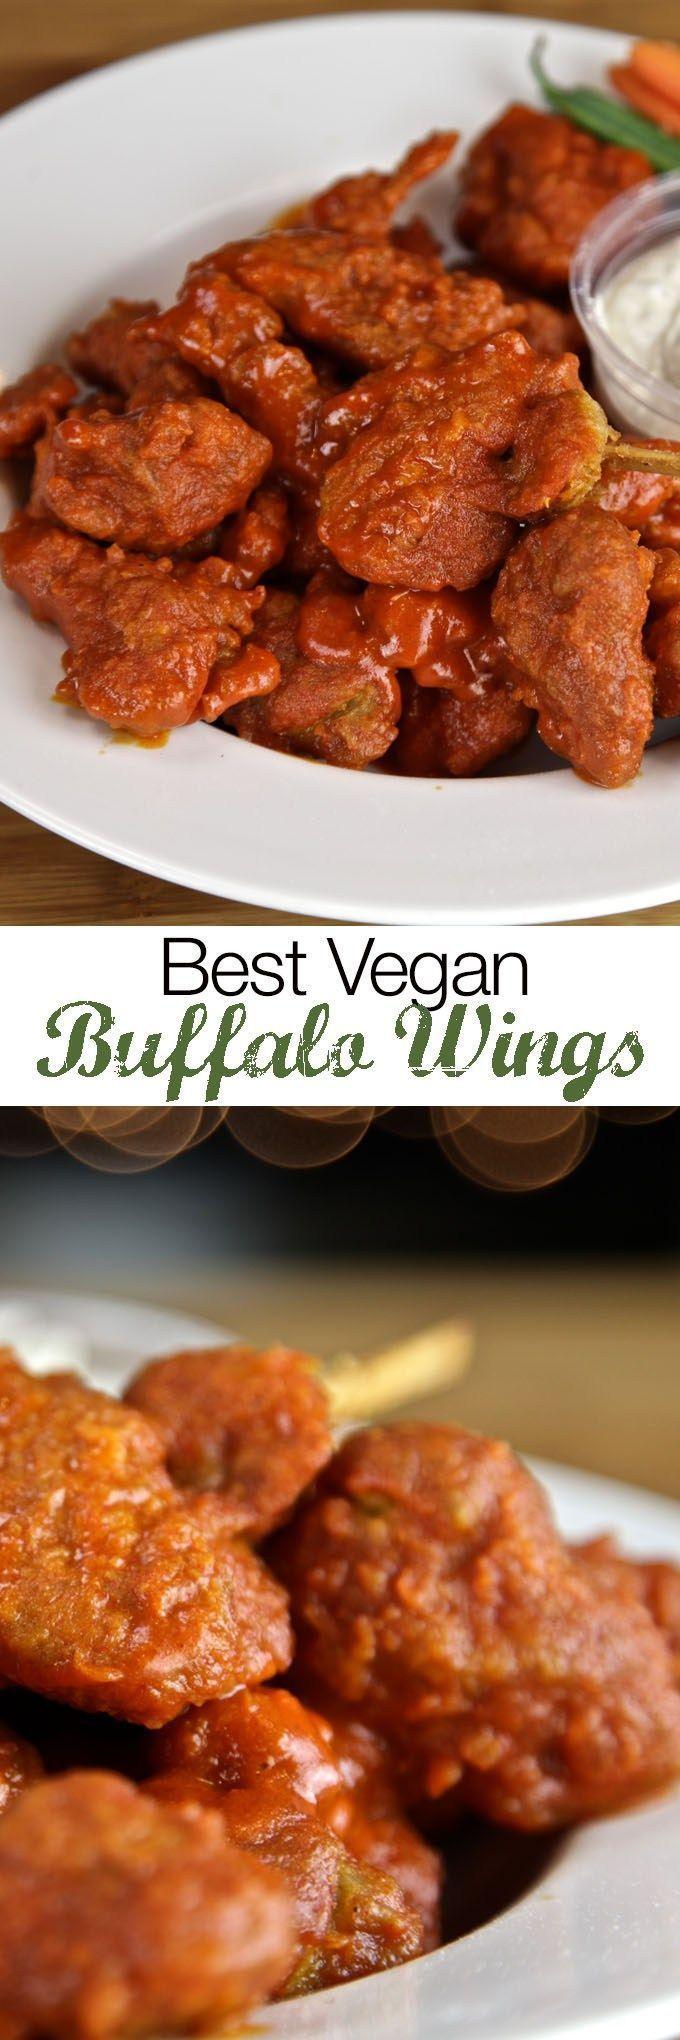 Vegan Buffalo Wings Give these delicious vegan win